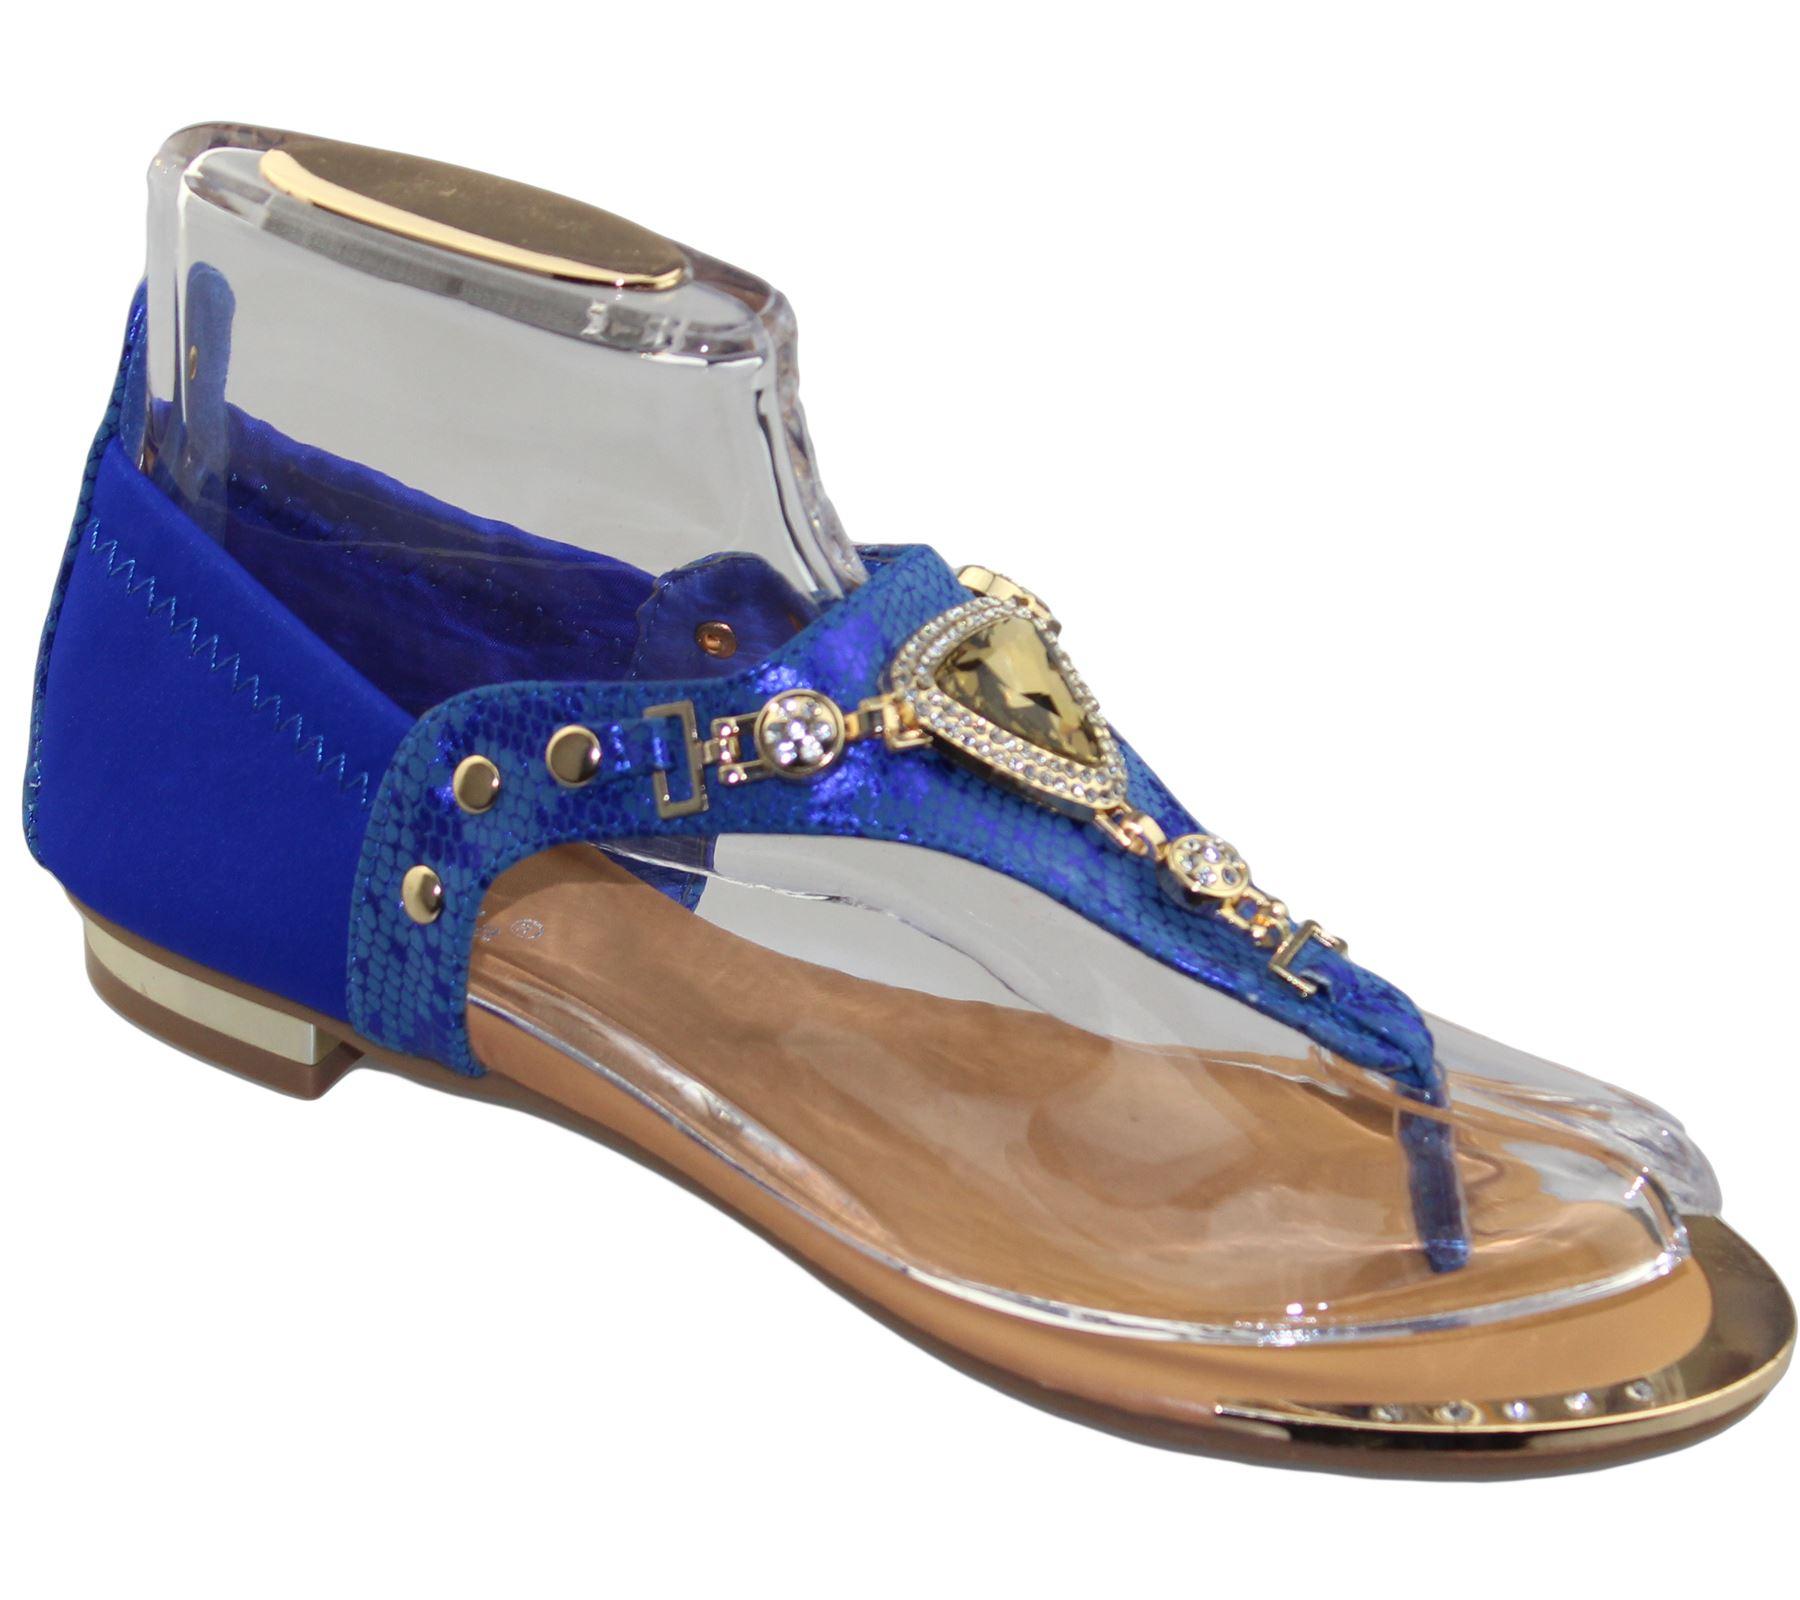 Womens-Flat-Summer-Sandals-Ladies-Diamante-Wedding-Toe-Post-Casual-Slipper thumbnail 26